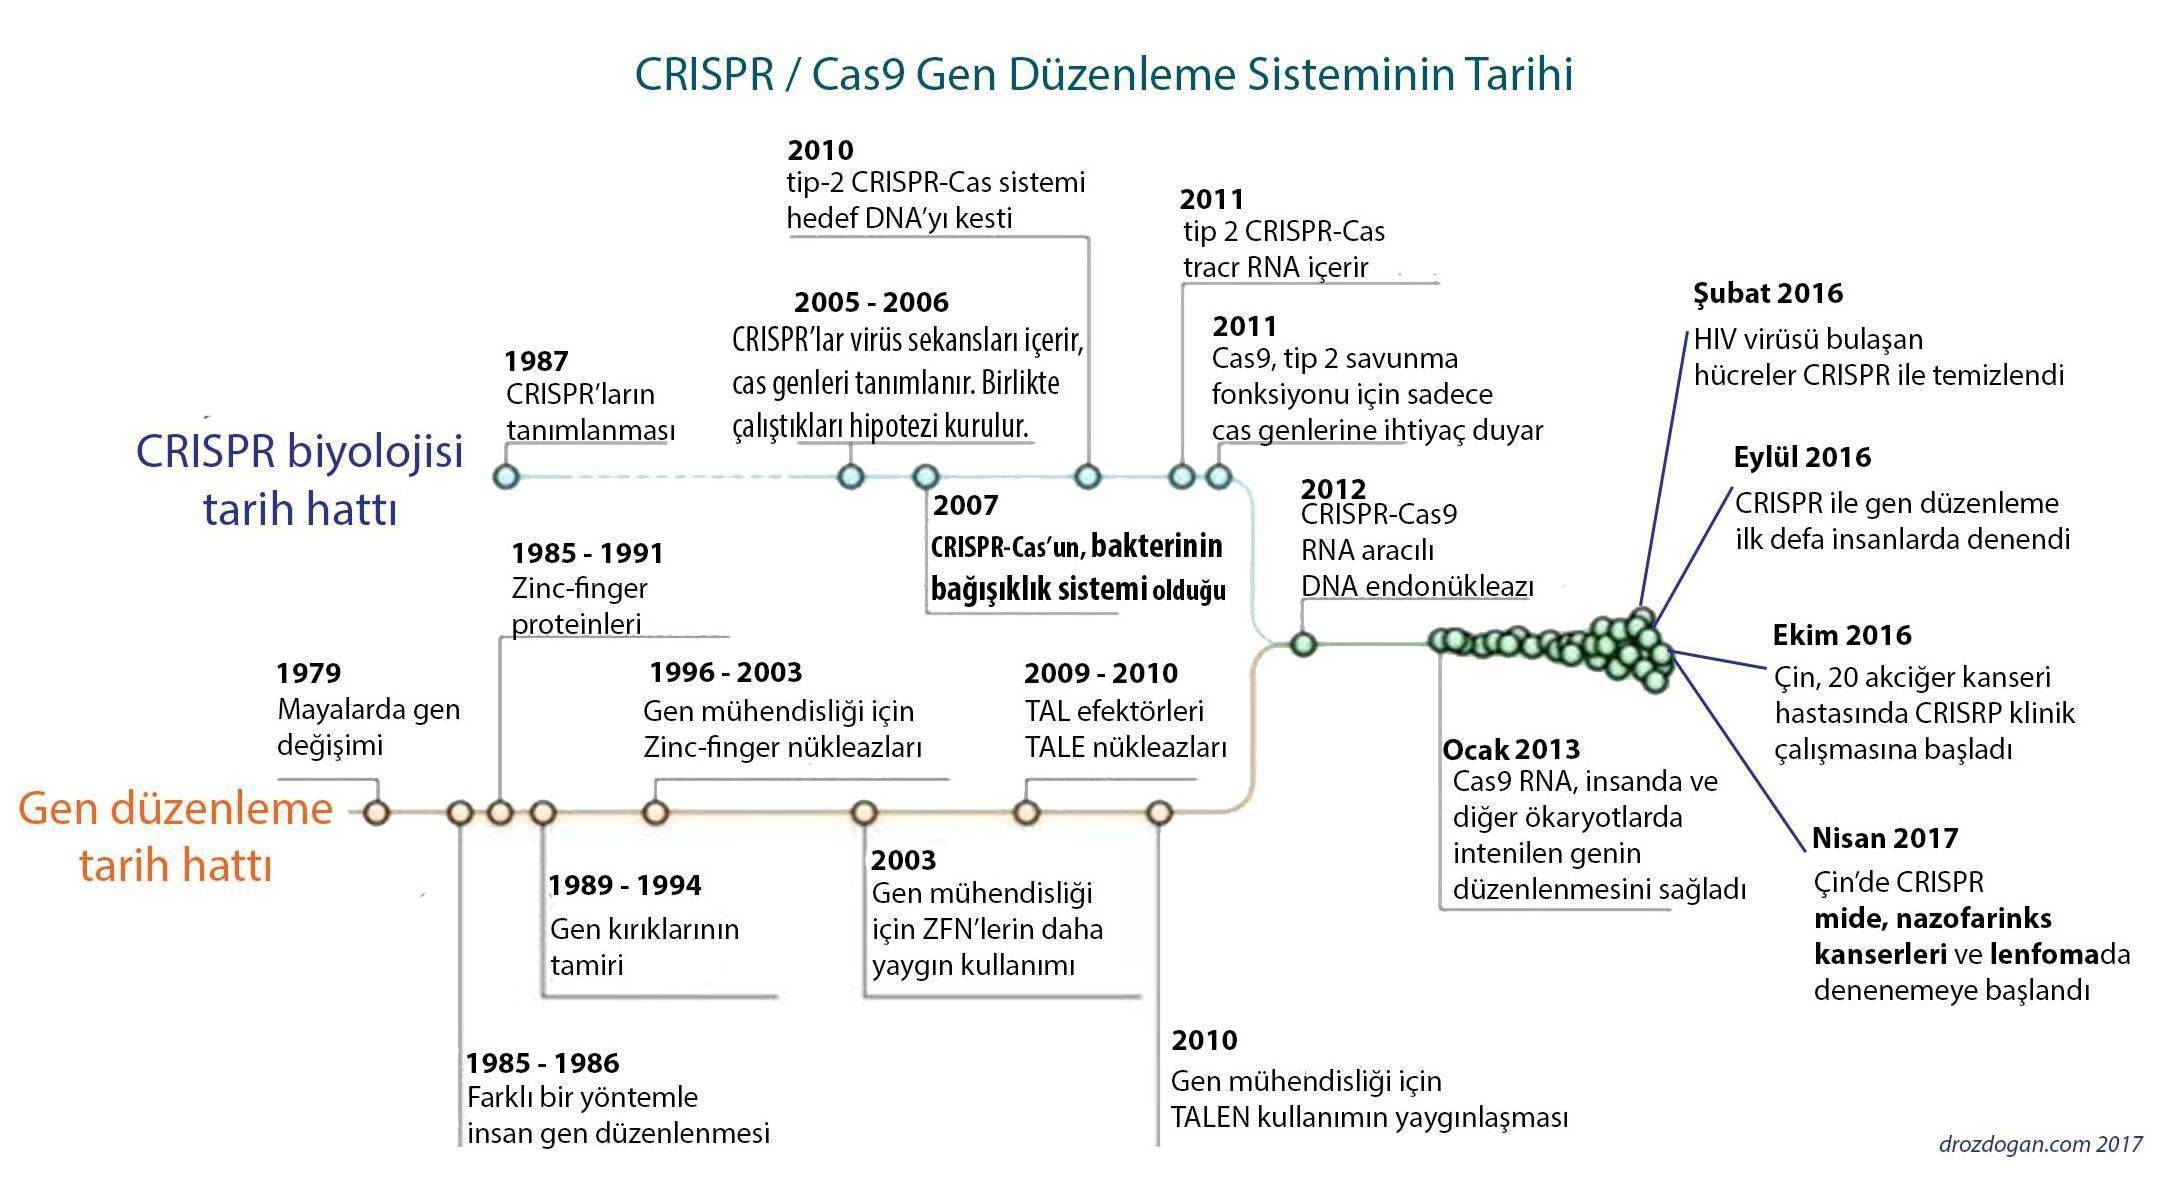 crispr ve kanser tarihi gen duzenleme genom editleme